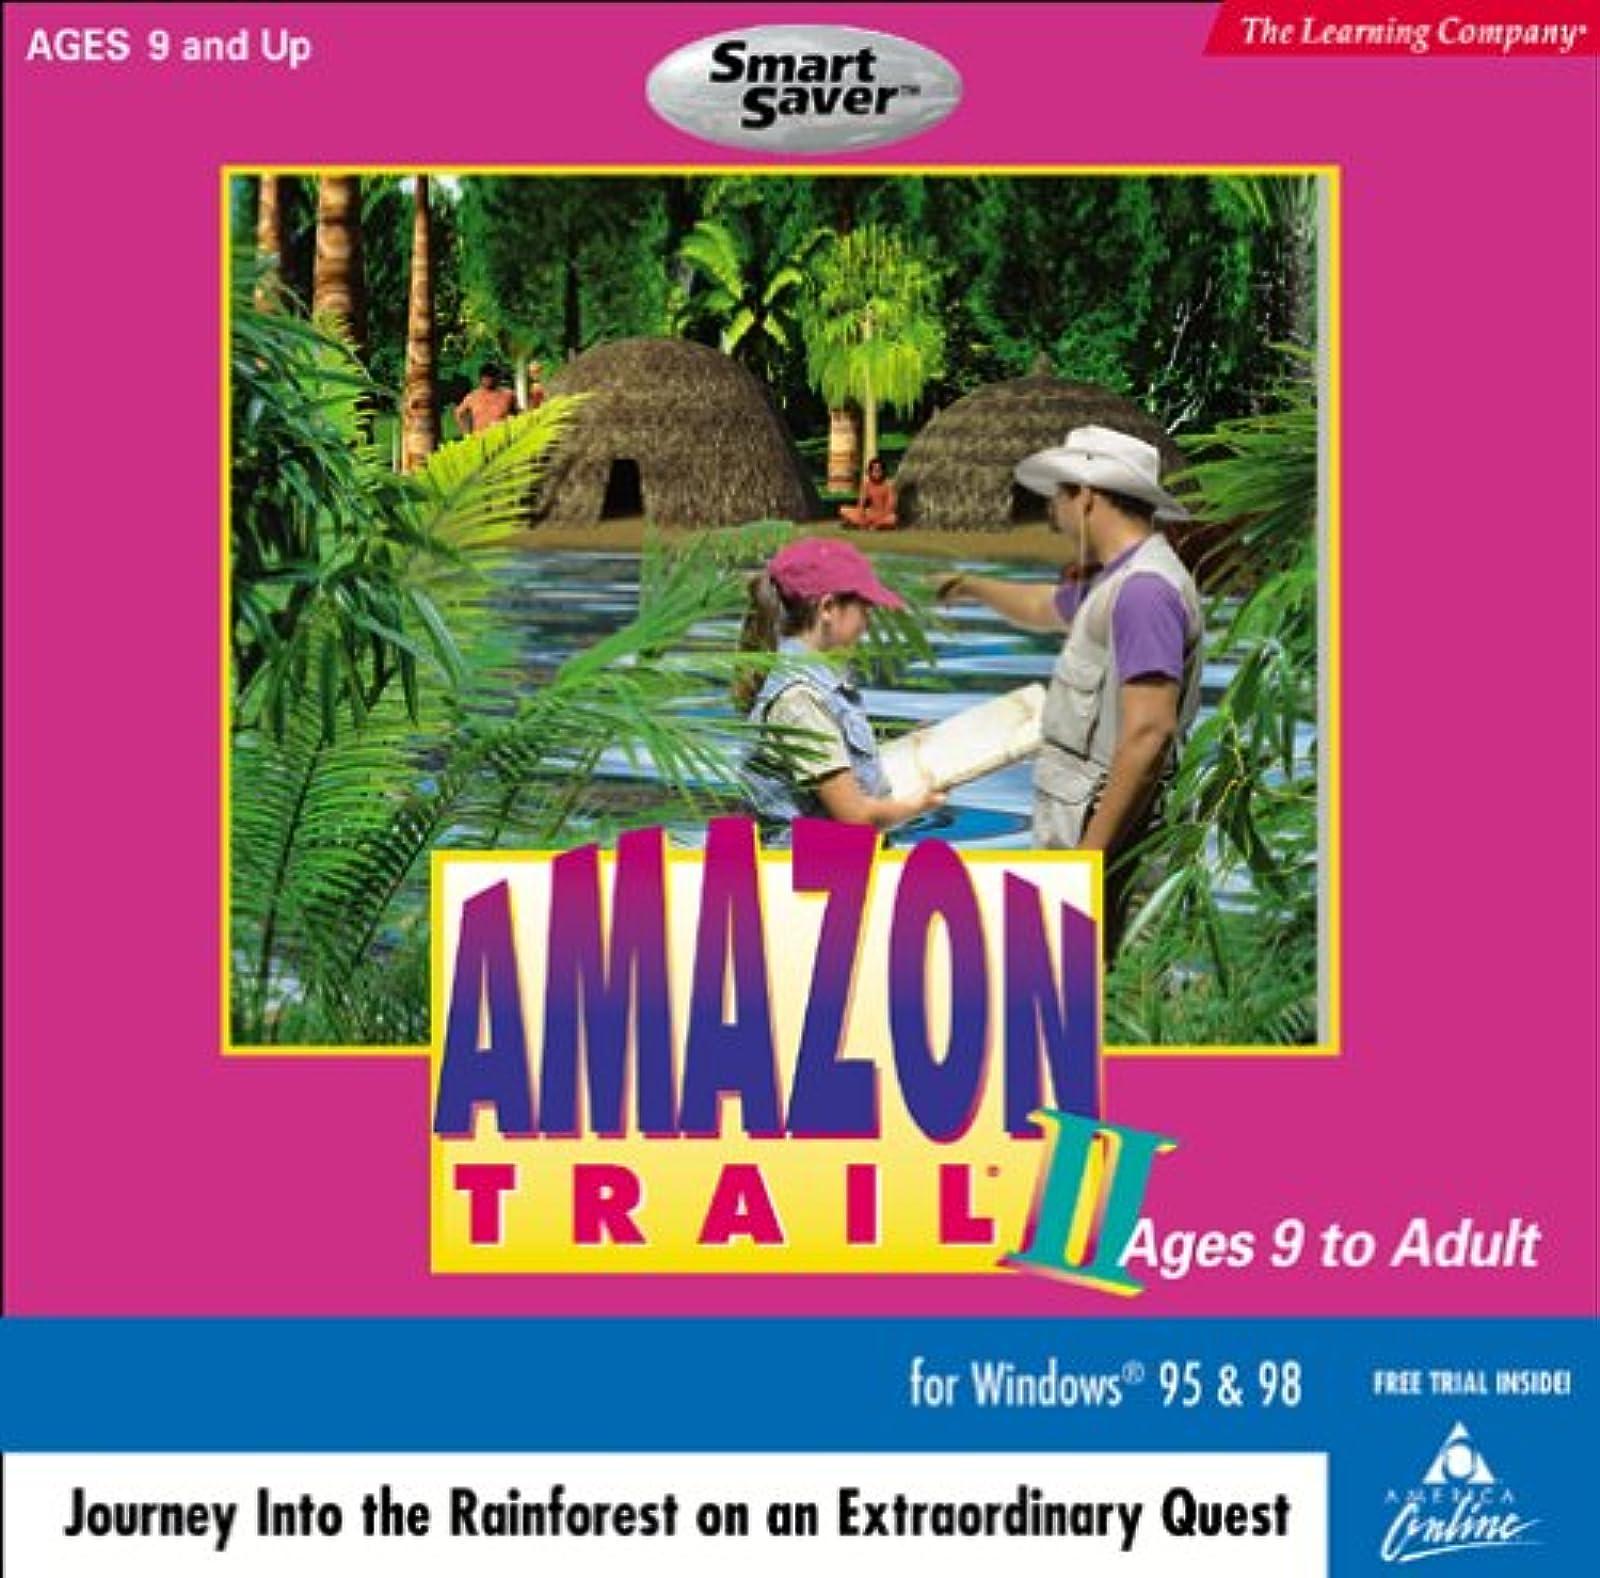 Amazon Trail 2 Software PC Vintage